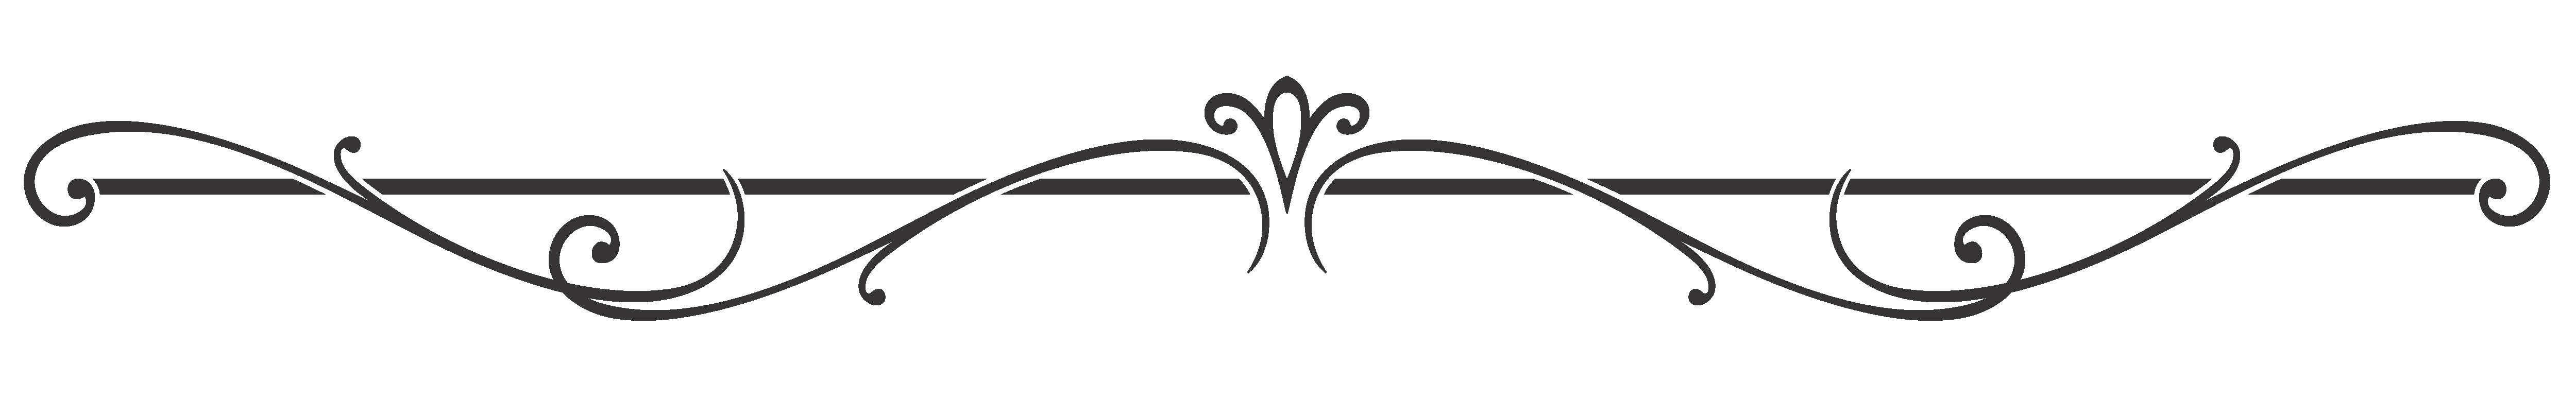 ▬arabesko.ru_05 без лого.png